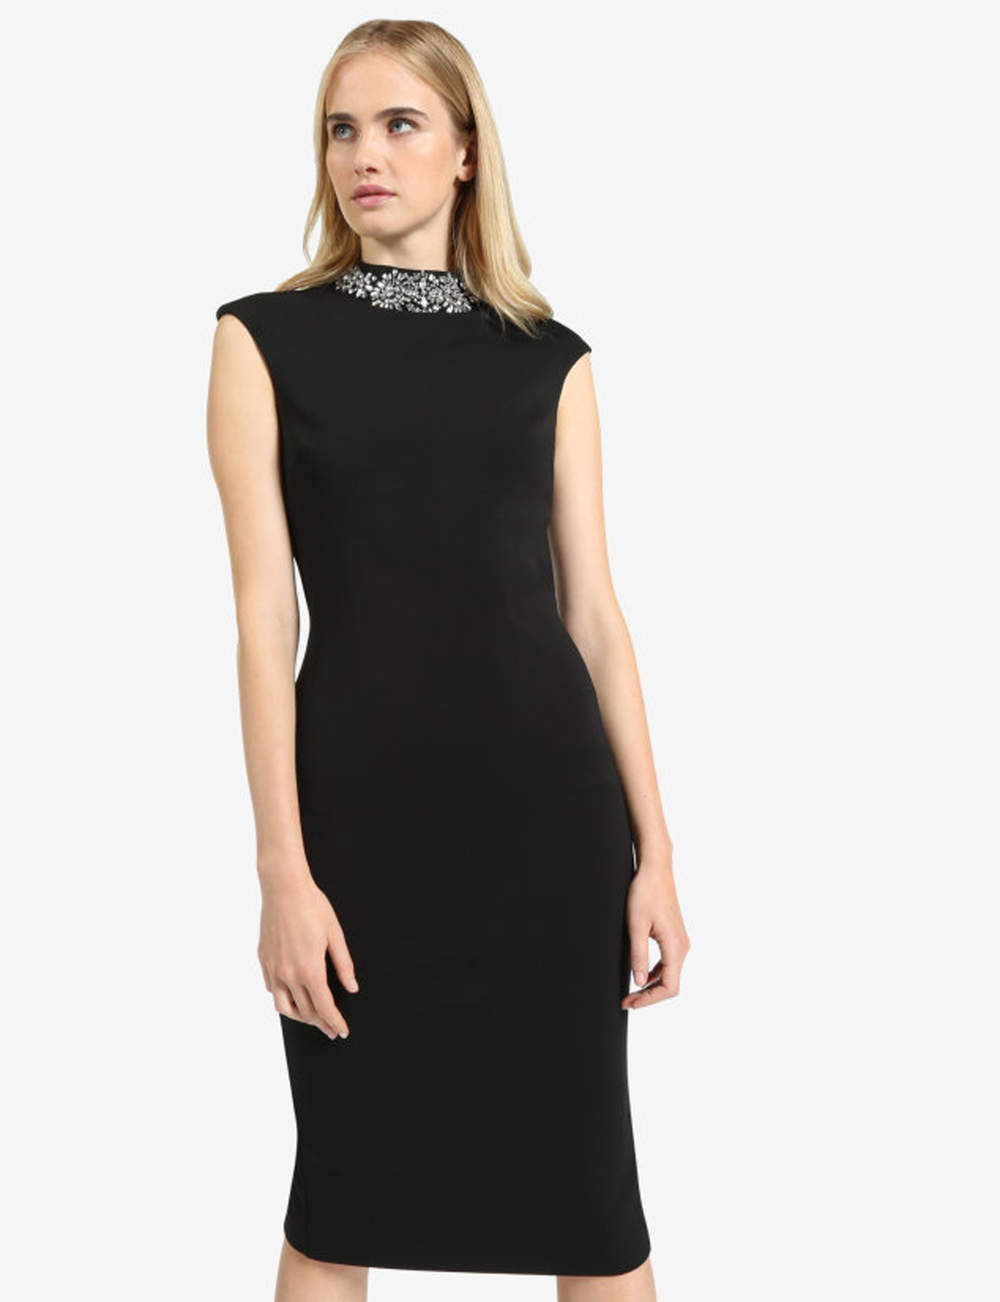 Robe noire : bijou